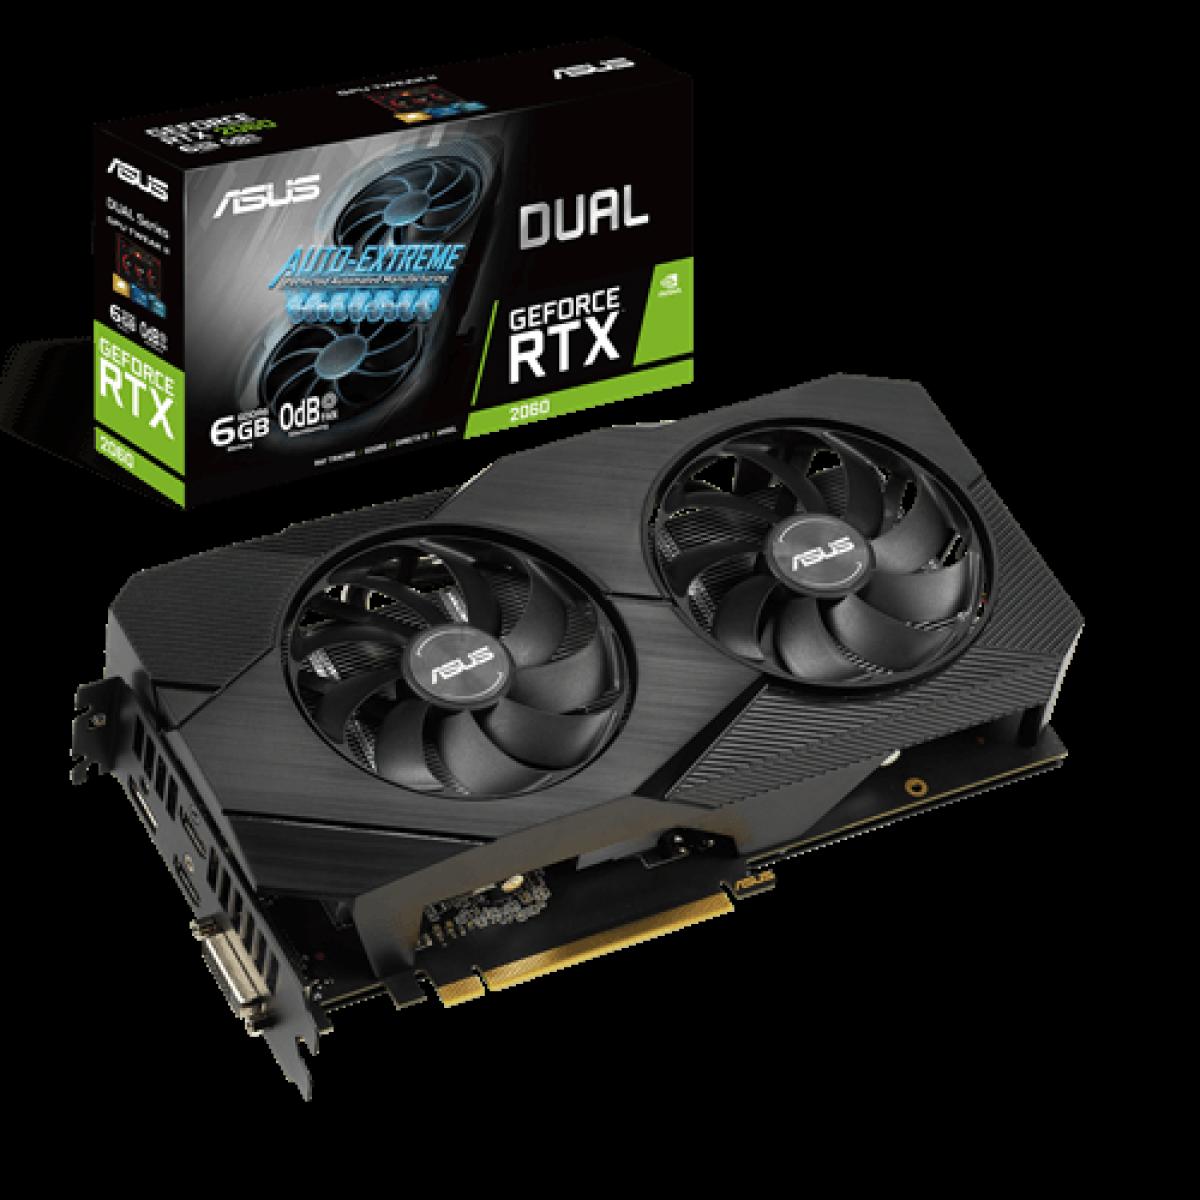 Placa de Vídeo Asus GeForce RTX 2060 EVO Dual, 6GB, GDDR6, 192bit, DUAL-RTX2060-6G-EVO